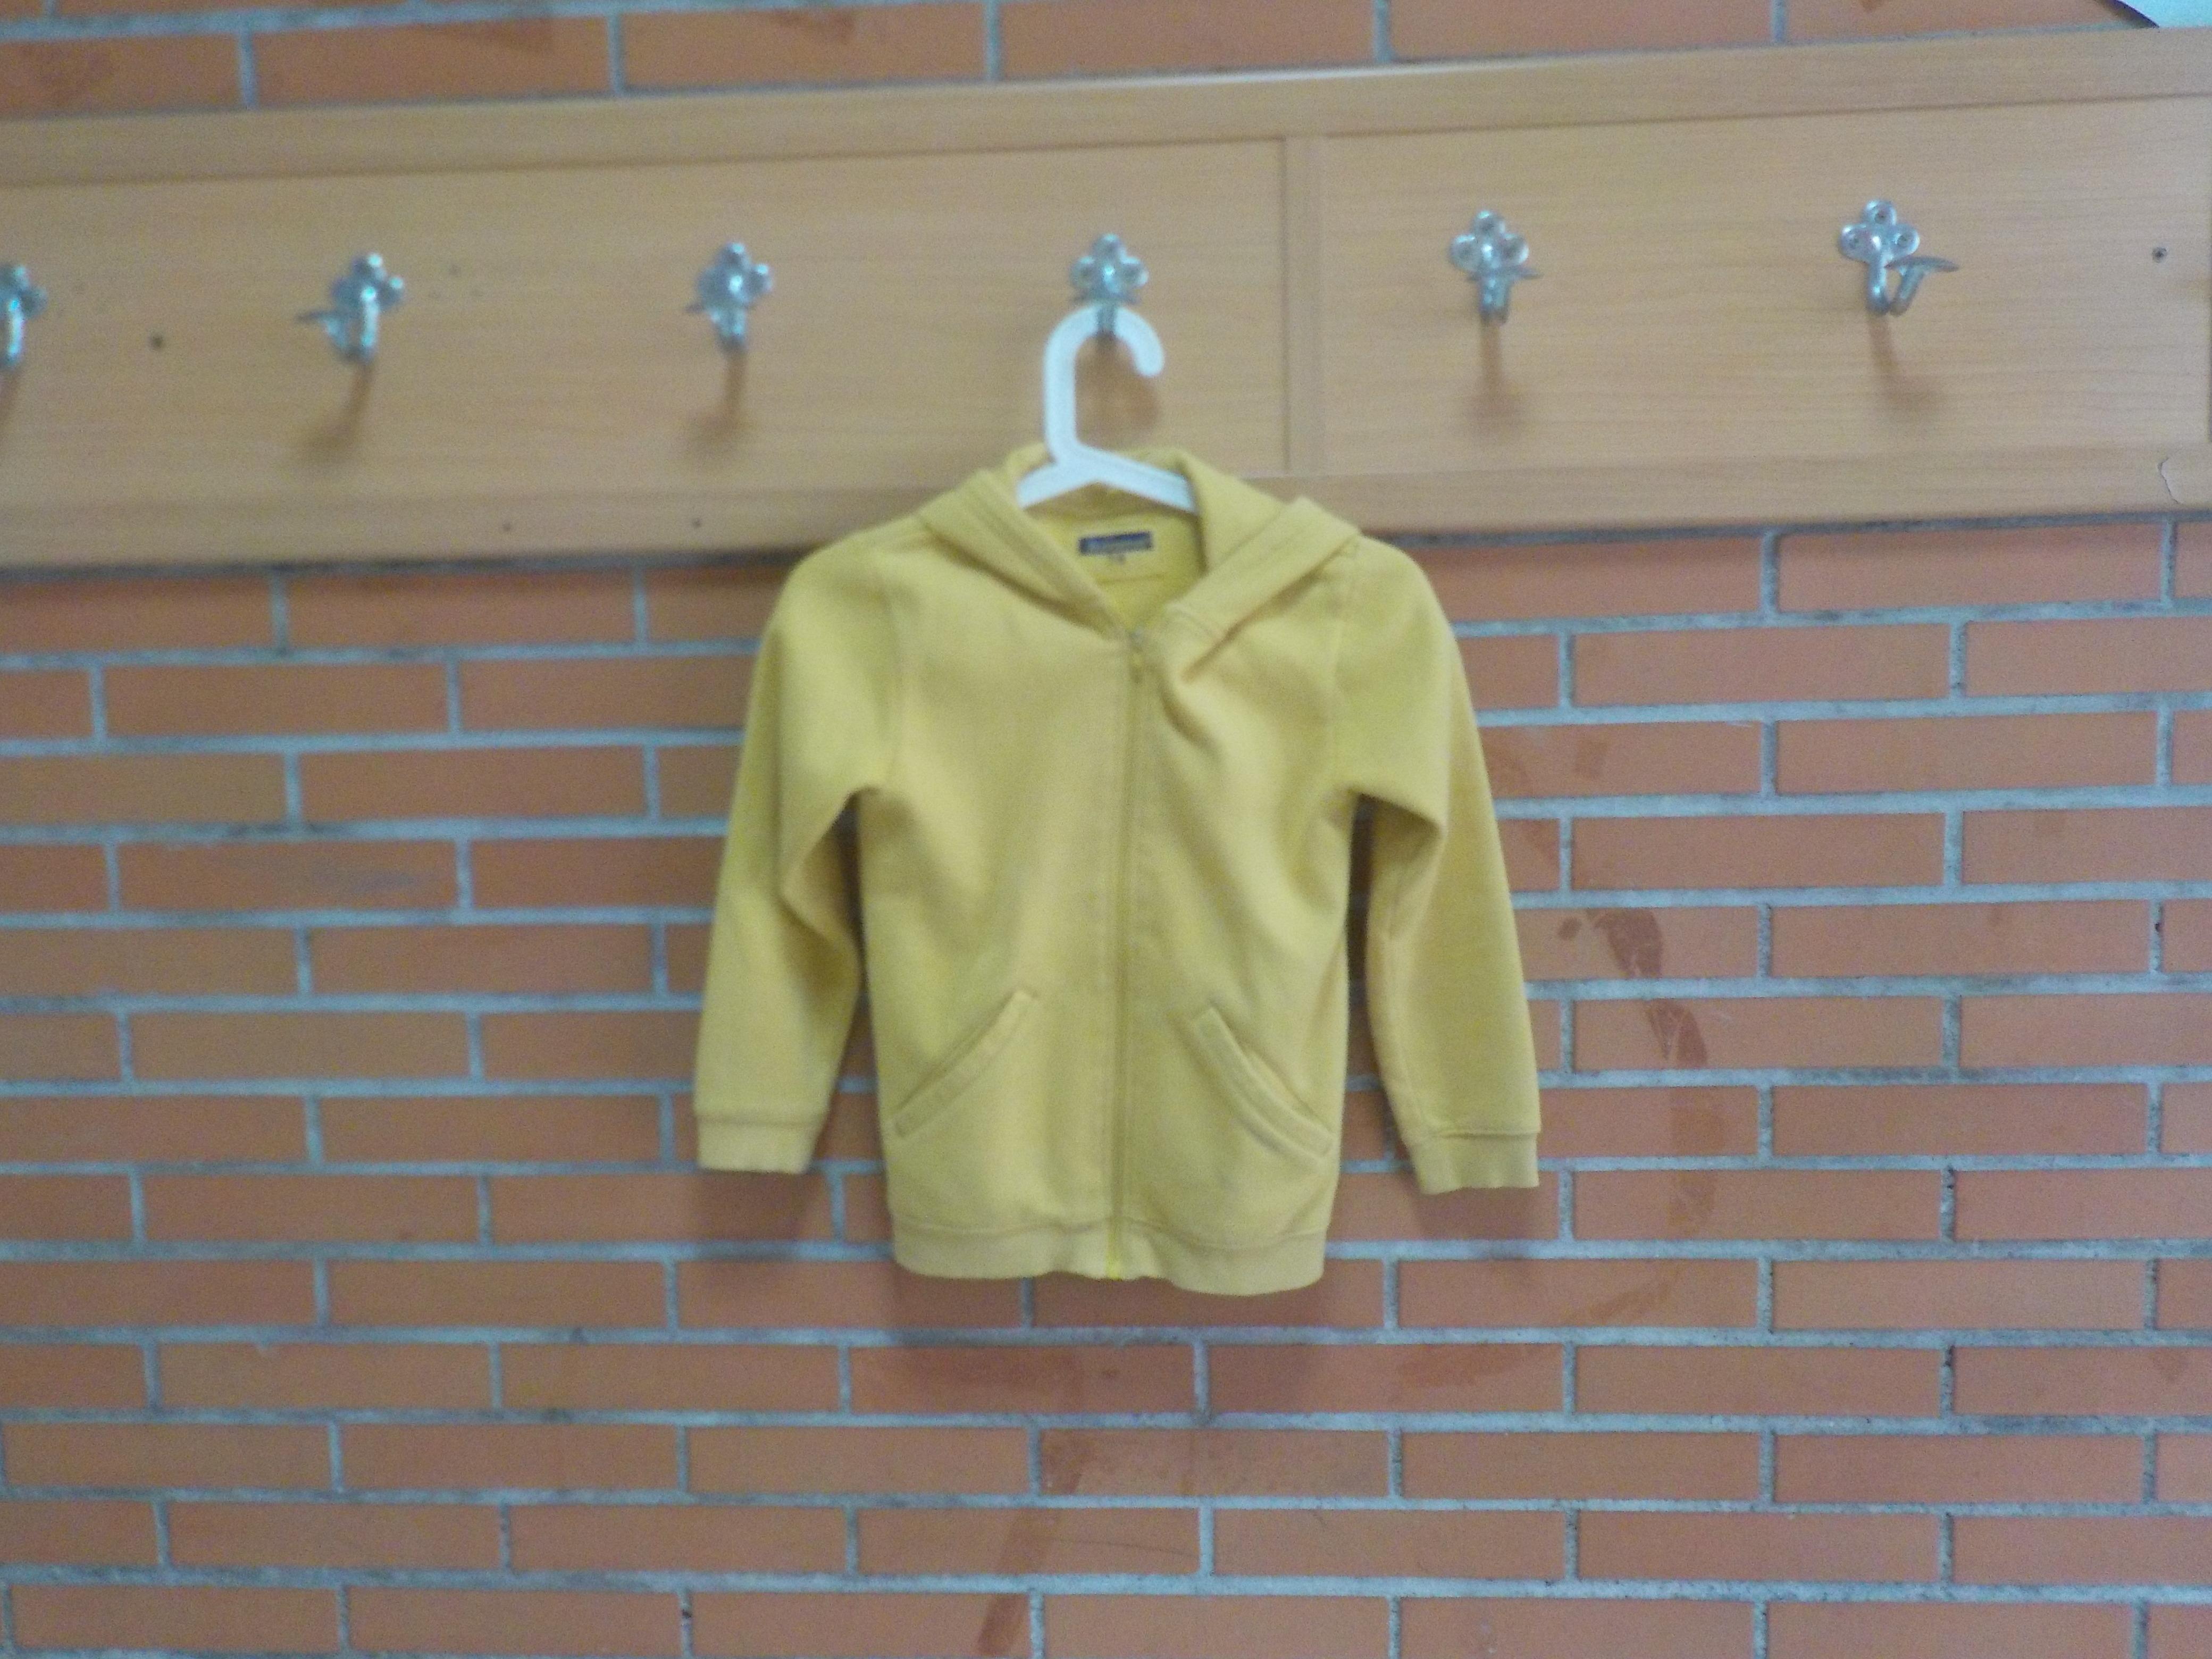 Catalogo de ropa olvidada 1  2018 8